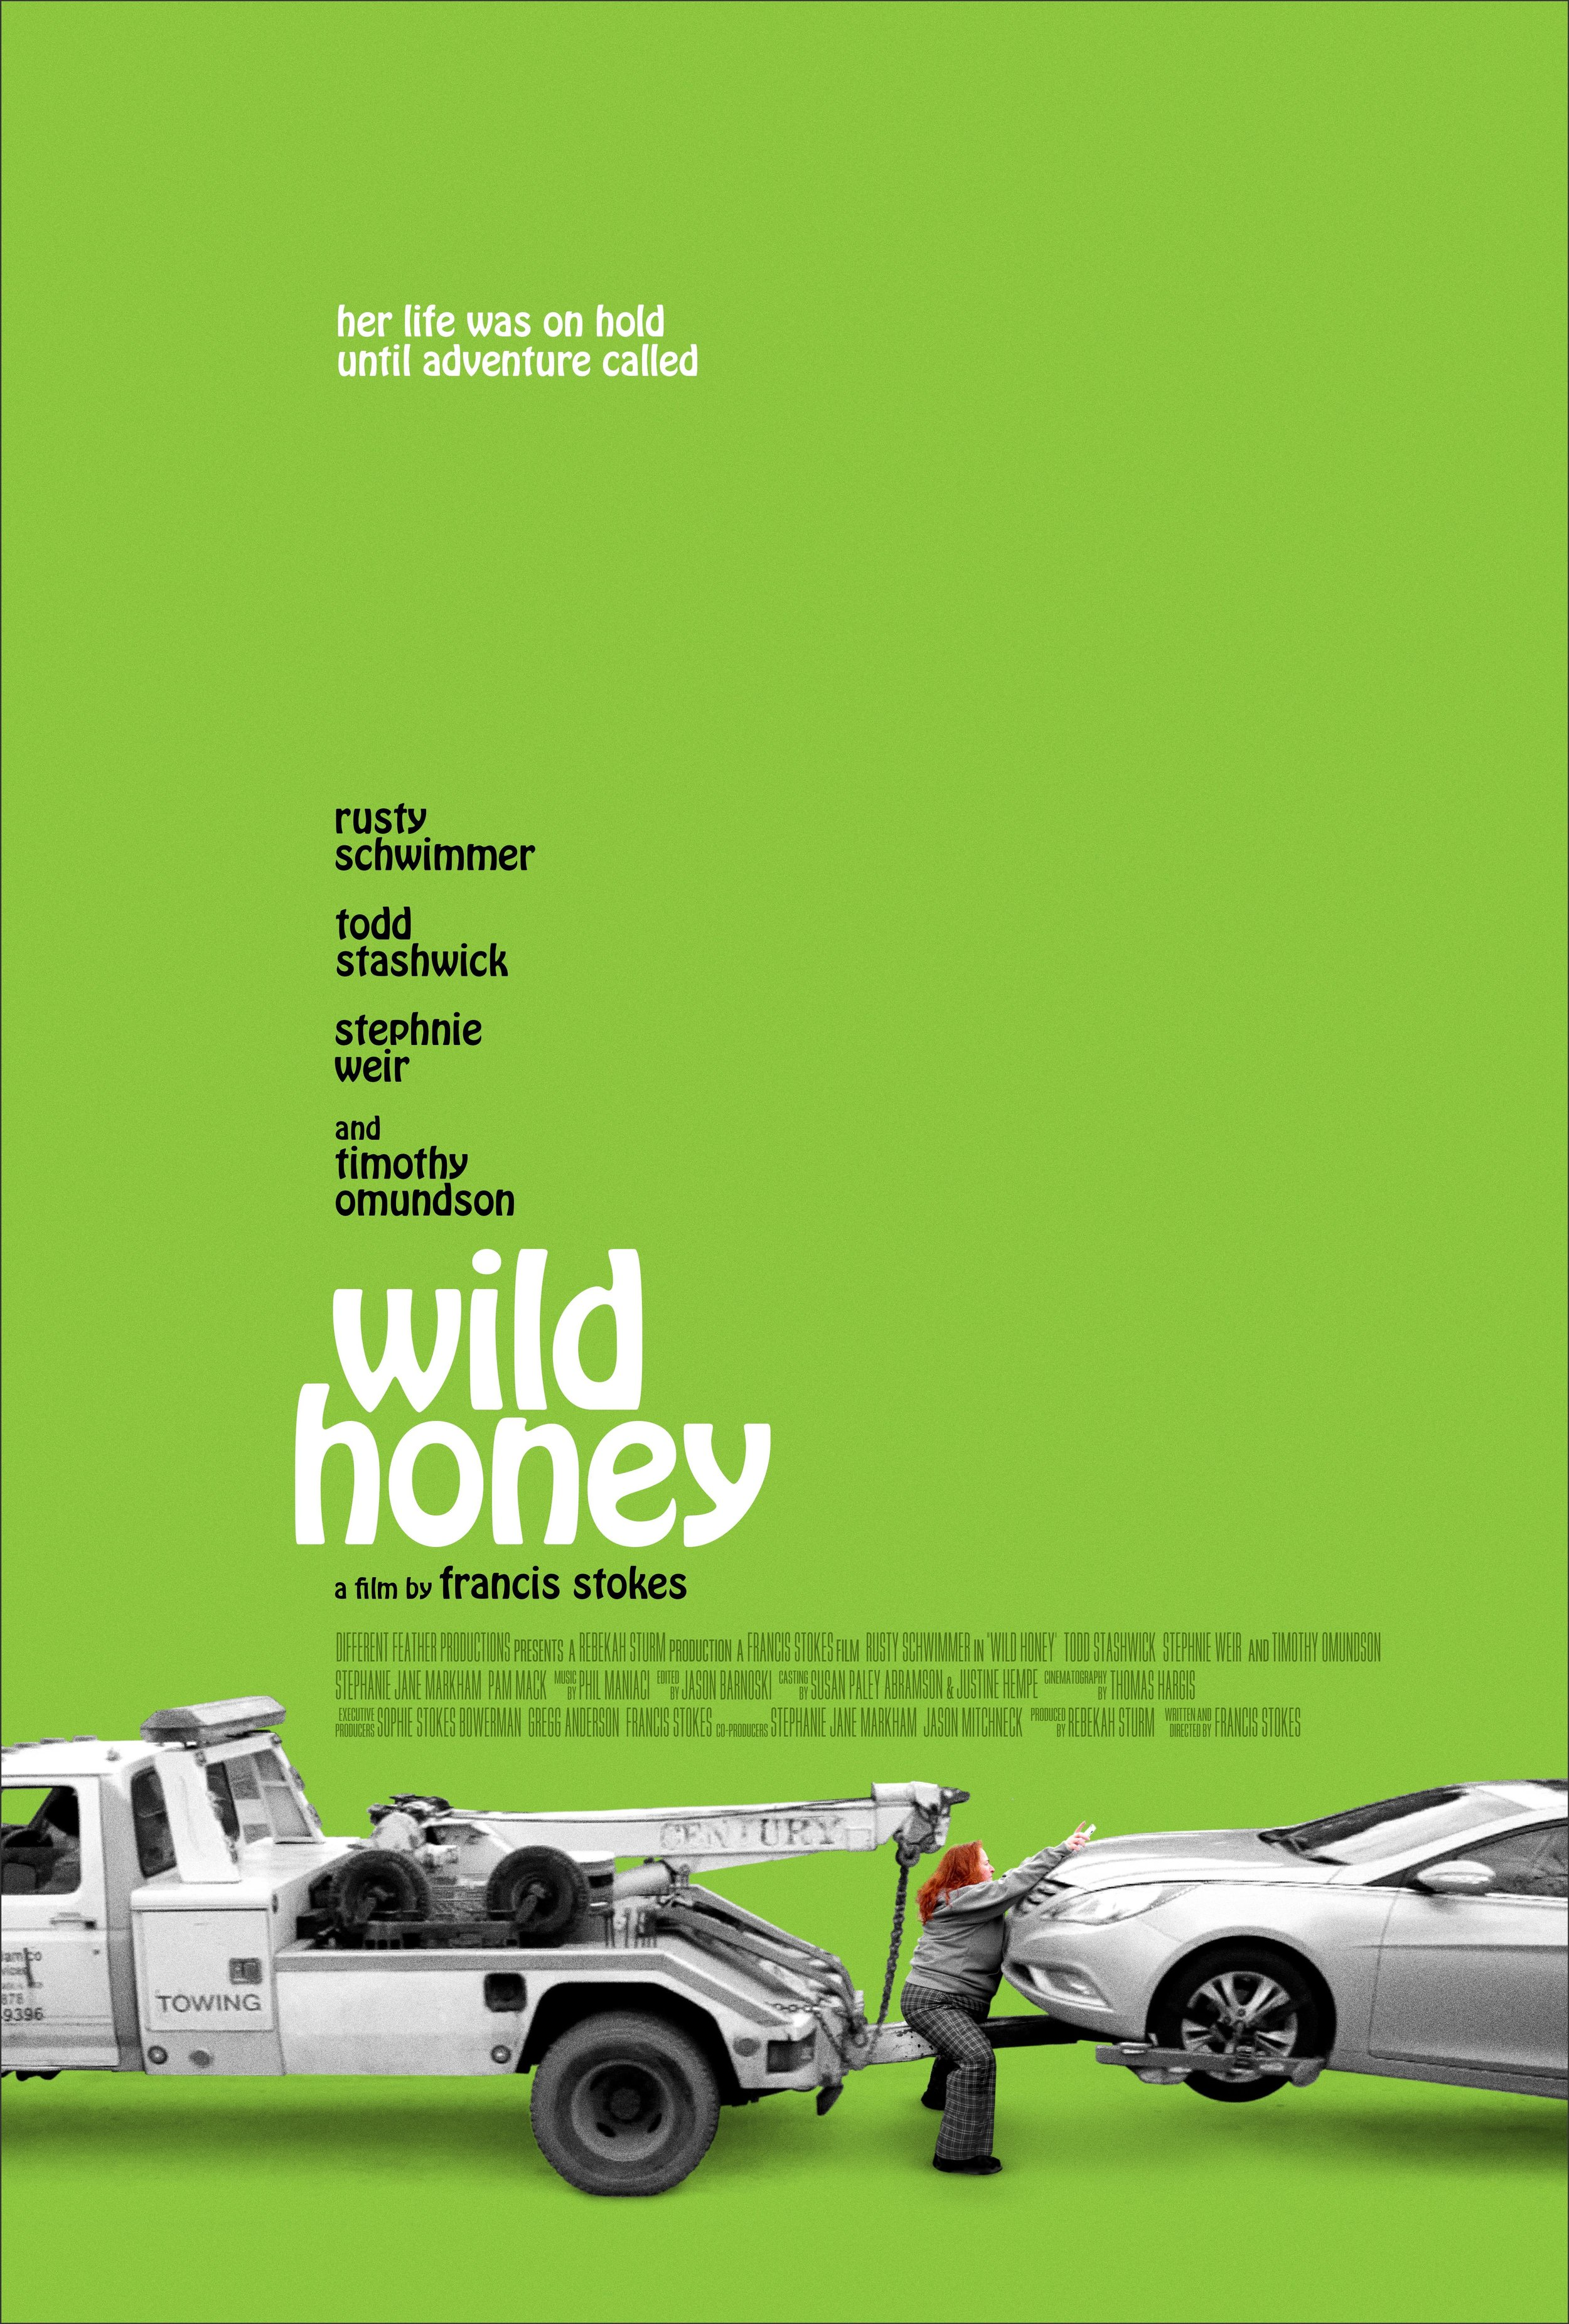 WildHoney social Media Poster.jpg